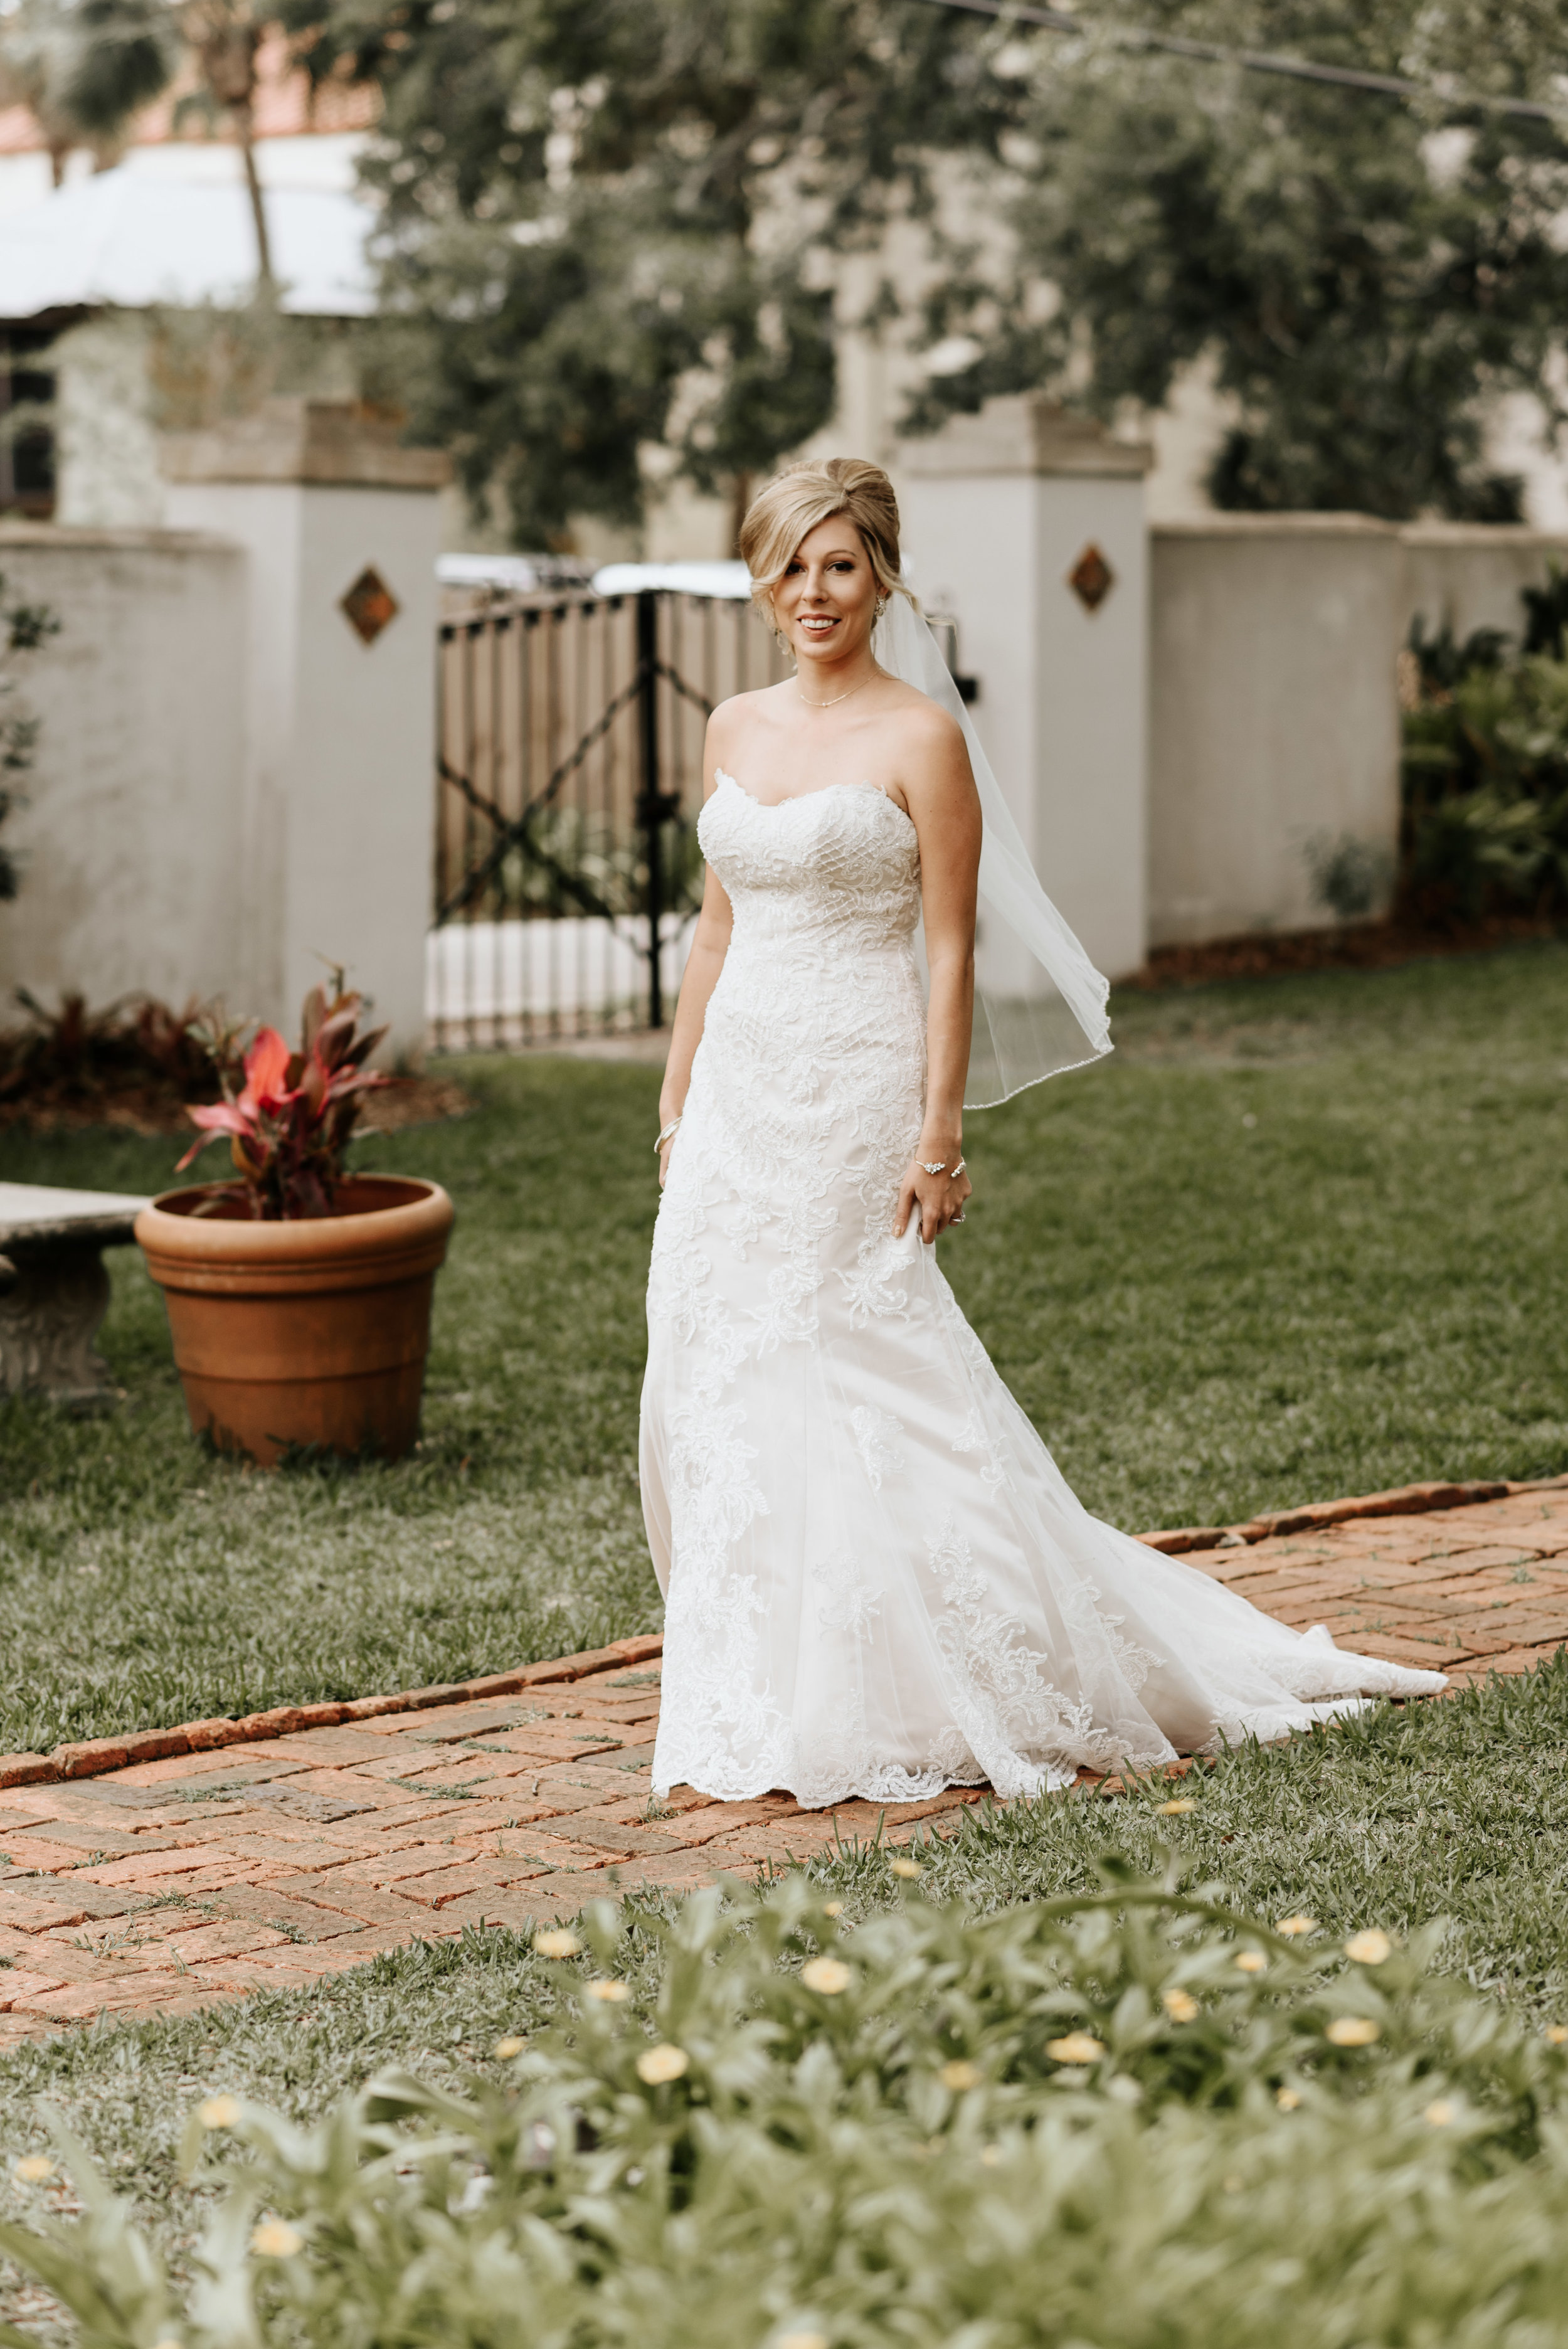 Mandy-Brad-Wedding-Previews-0152.jpg